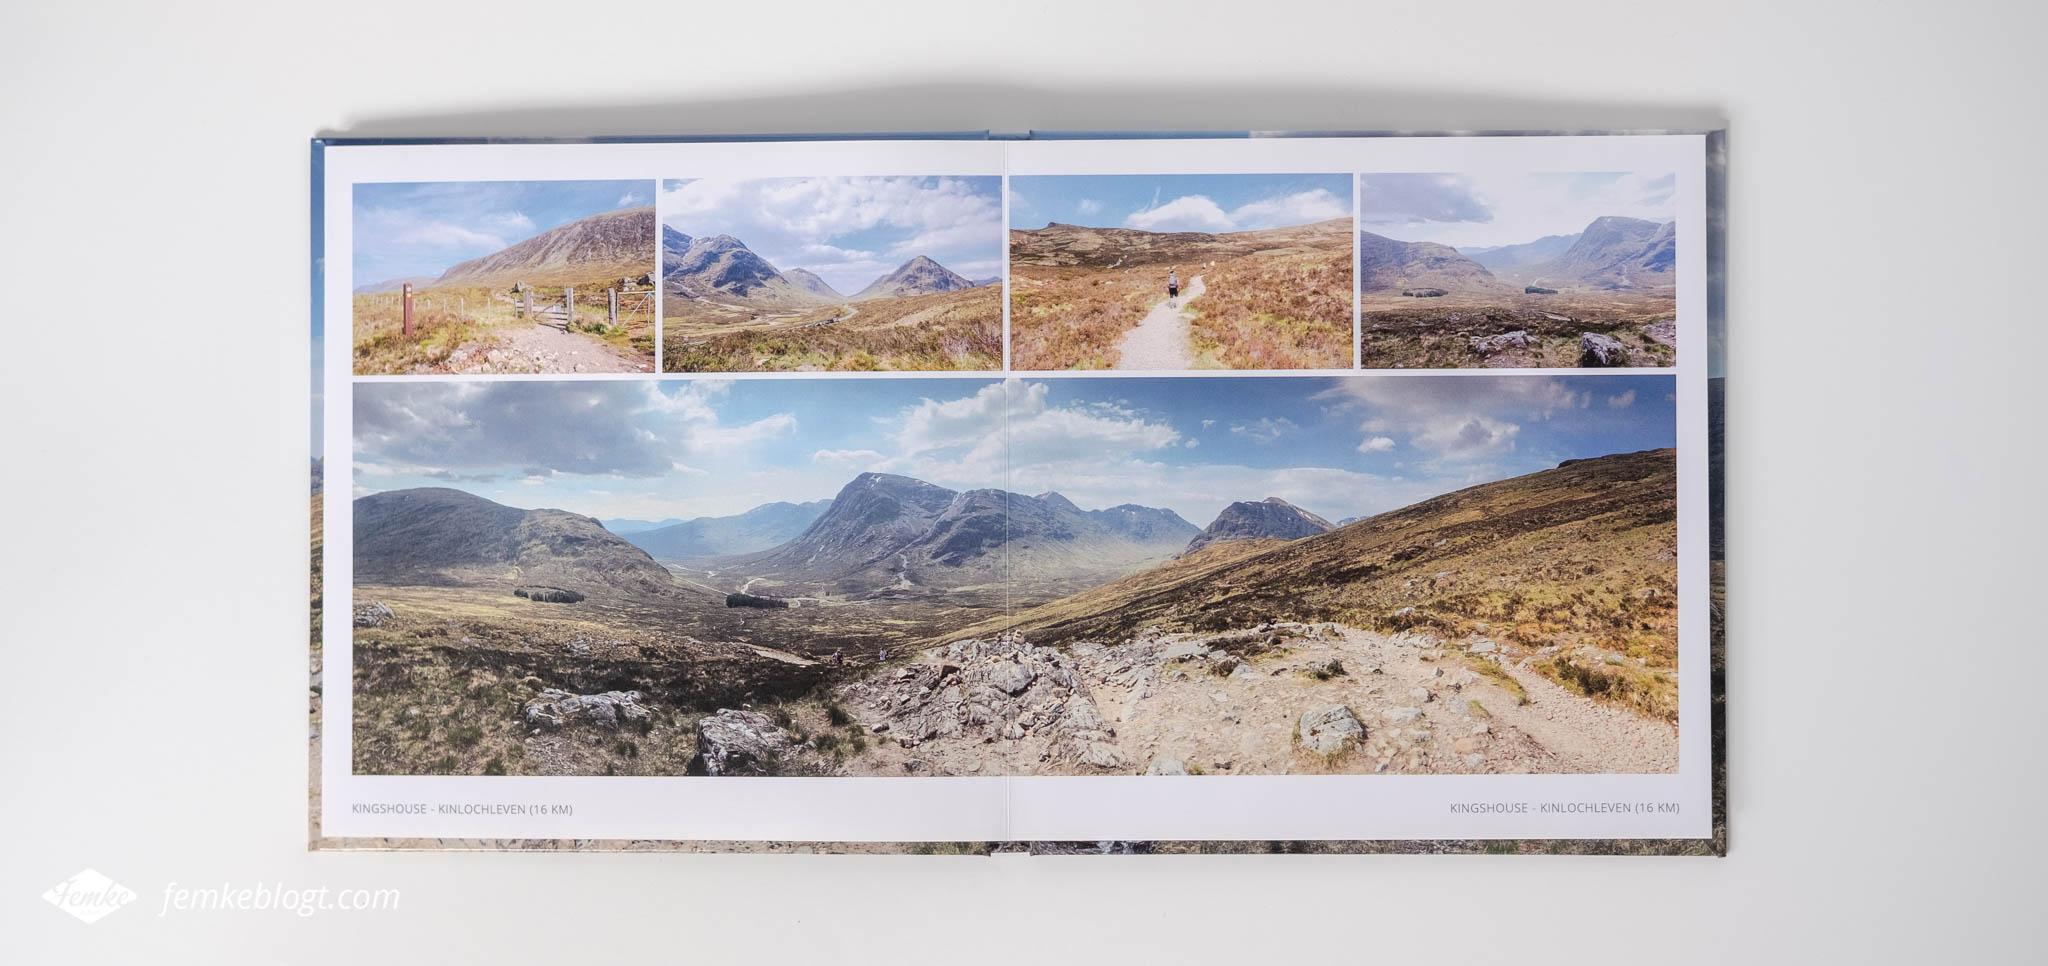 Vlakliggend fotoboek Schotland panoramafoto Fotofabriek